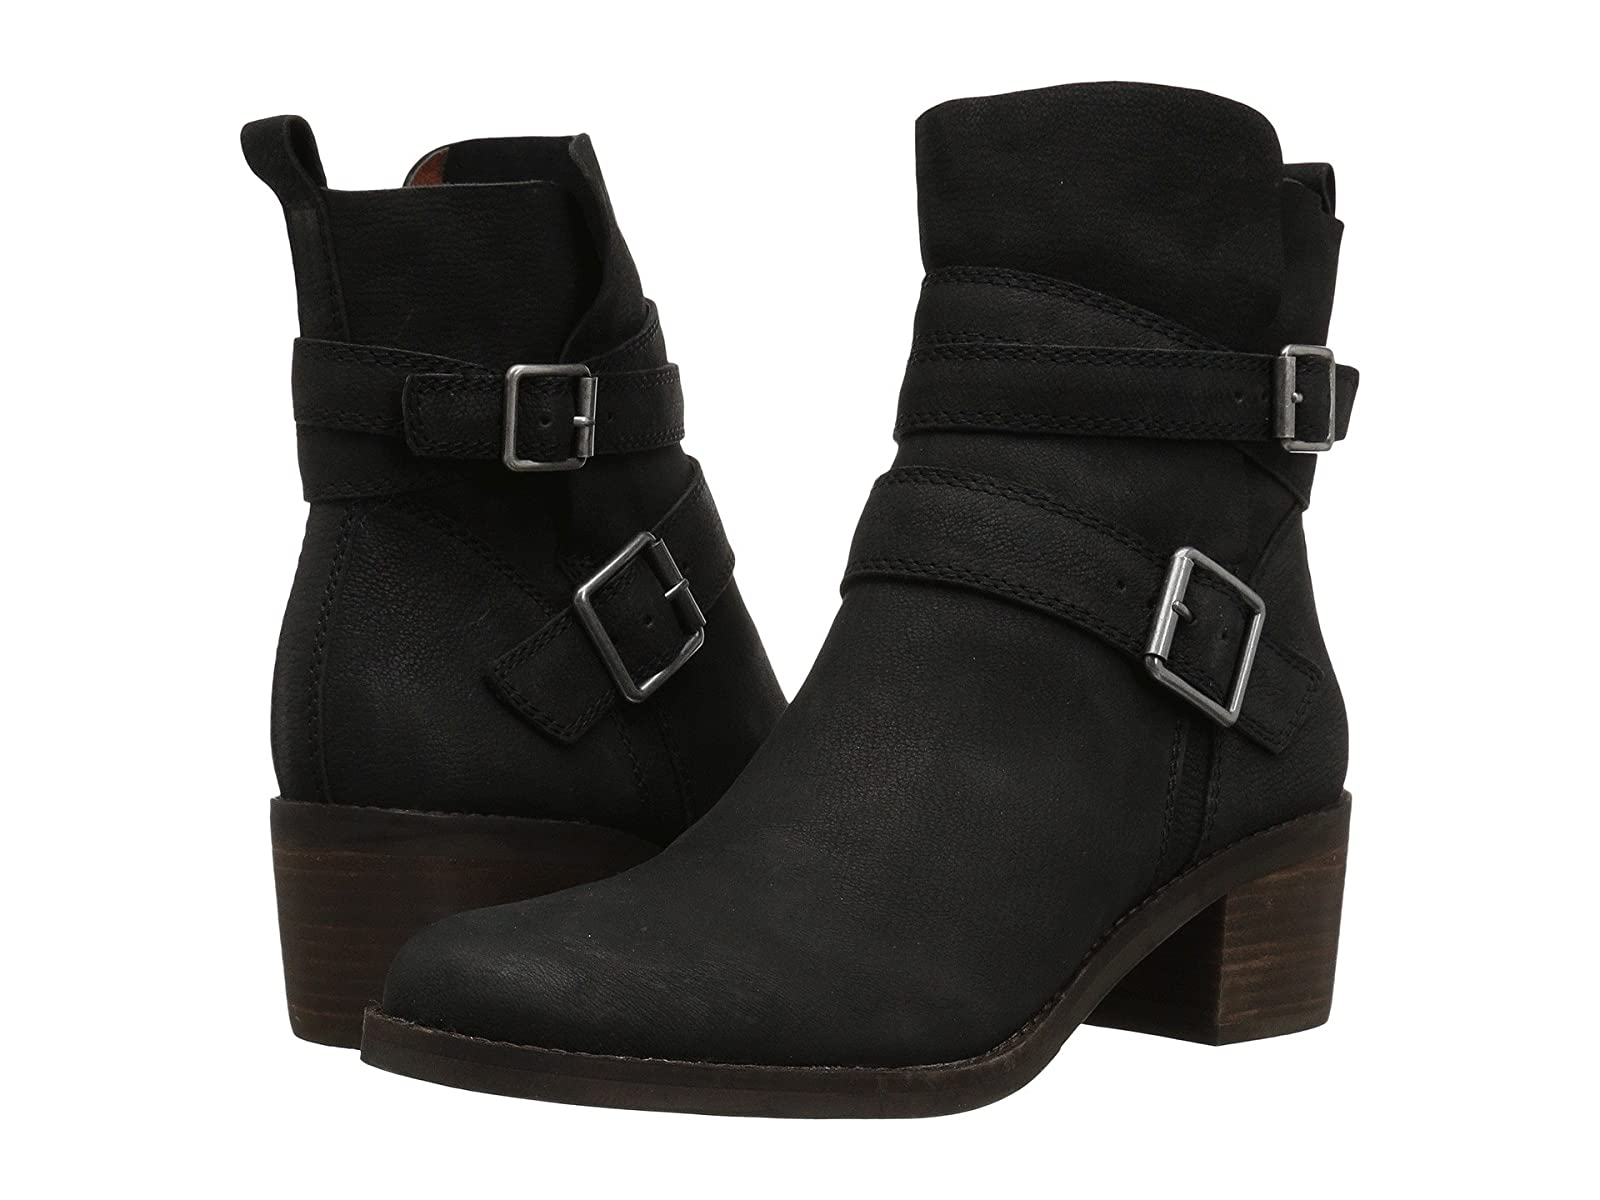 Lucky Brand CordeenaCheap and distinctive eye-catching shoes